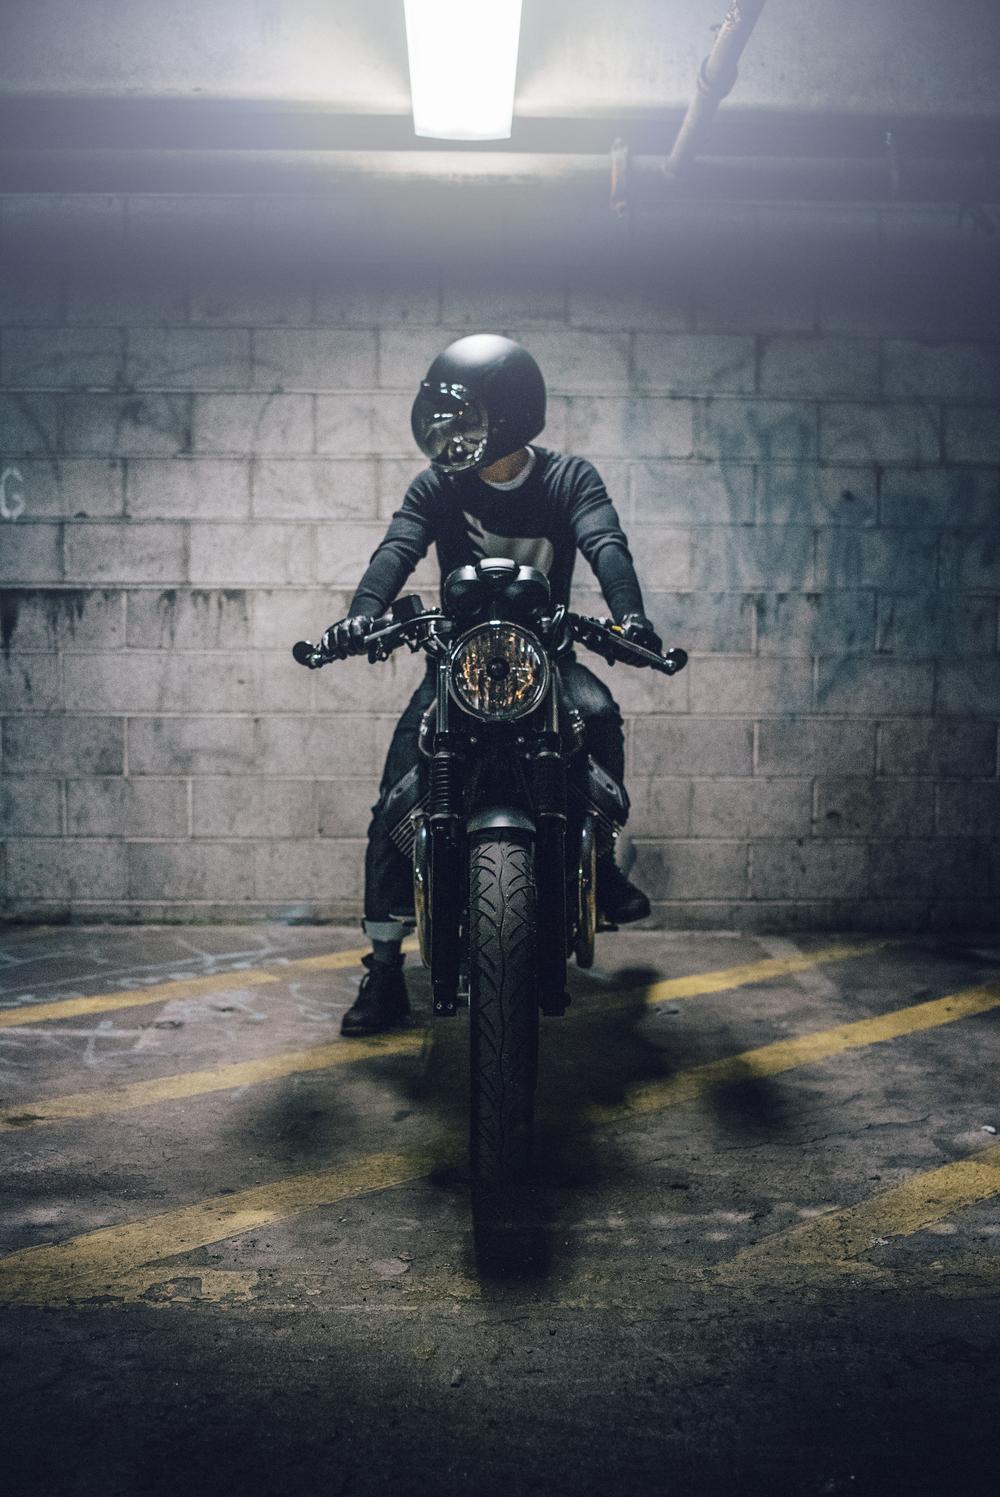 Moto Guzzi 3.jpg